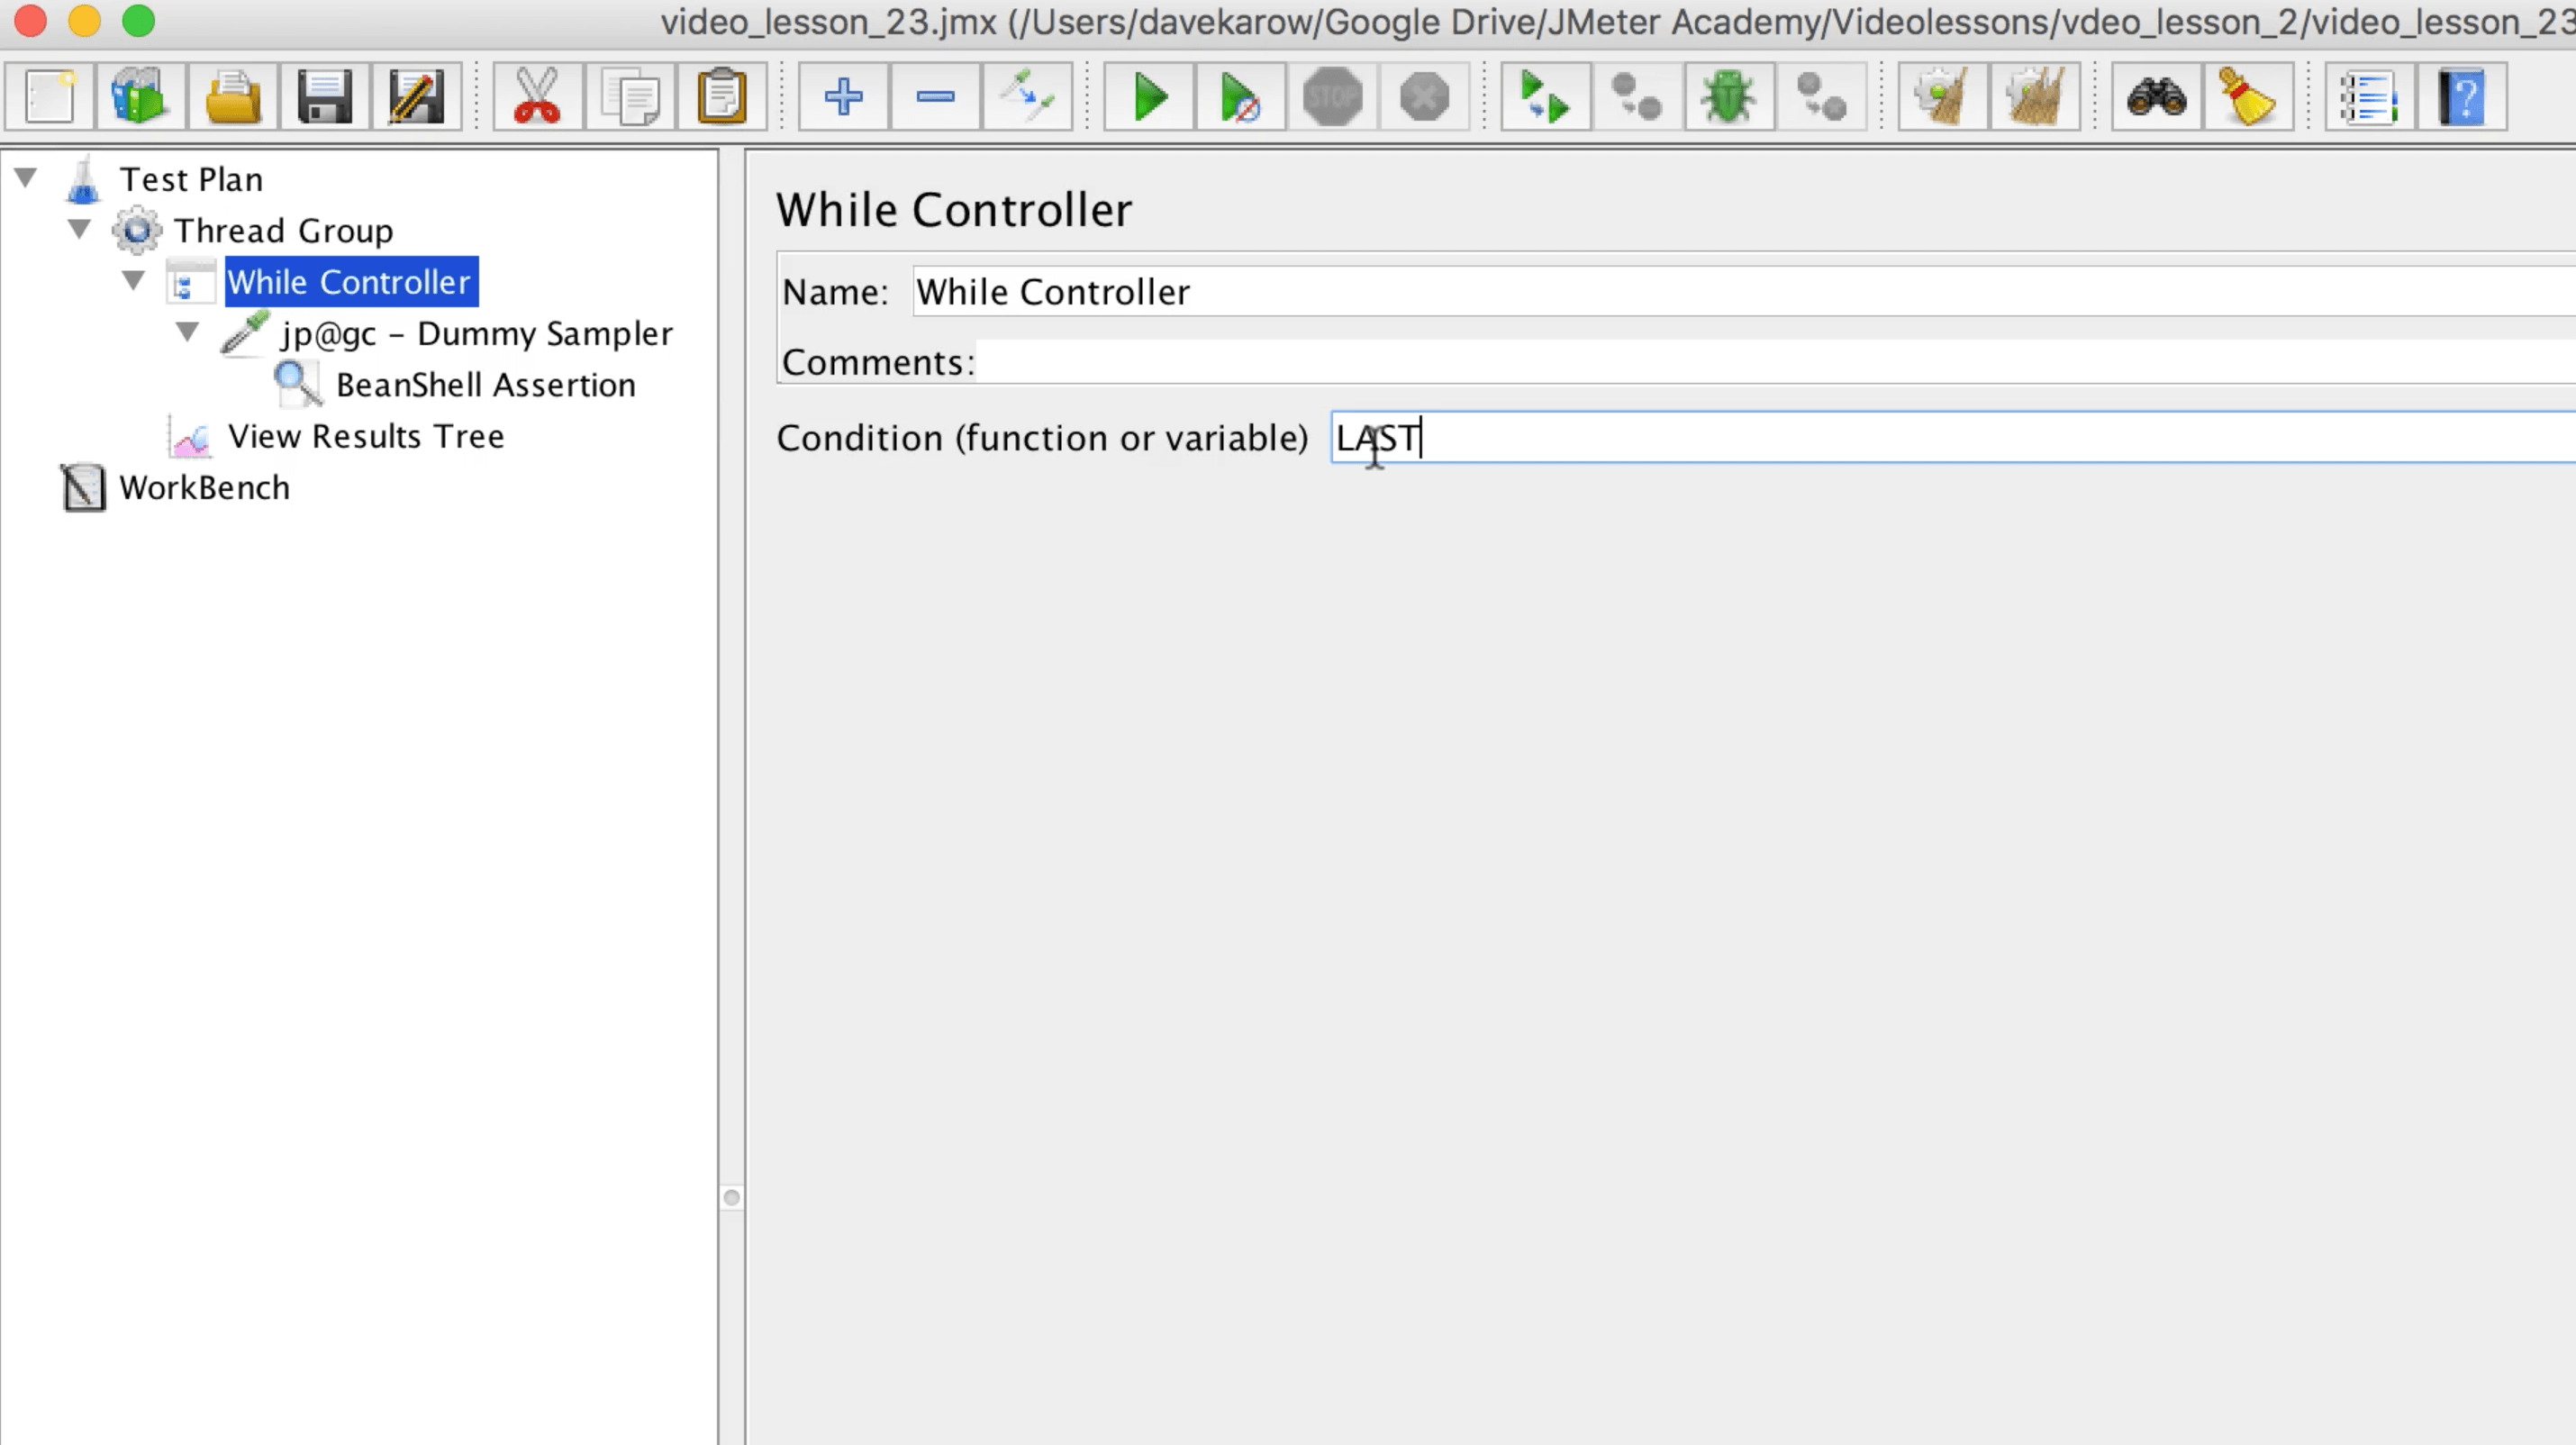 JMeter's Logic Controllers